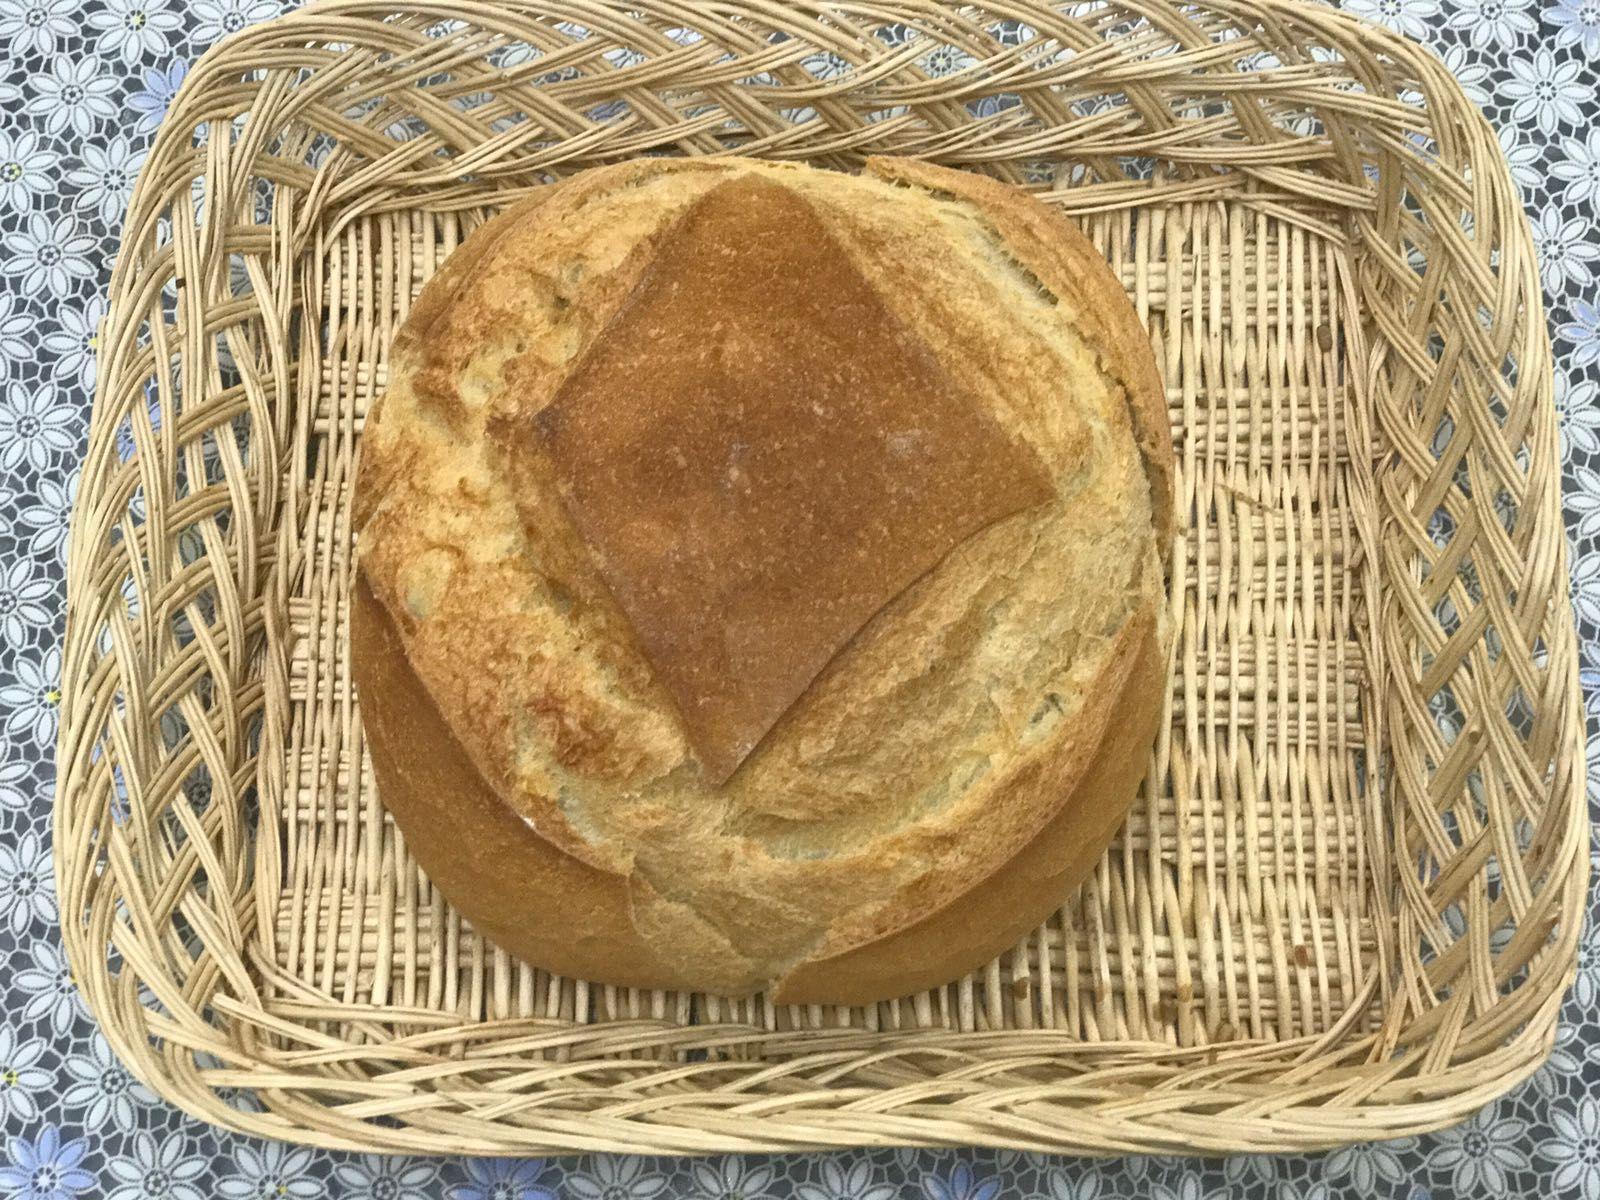 Pan artesanal en Onil